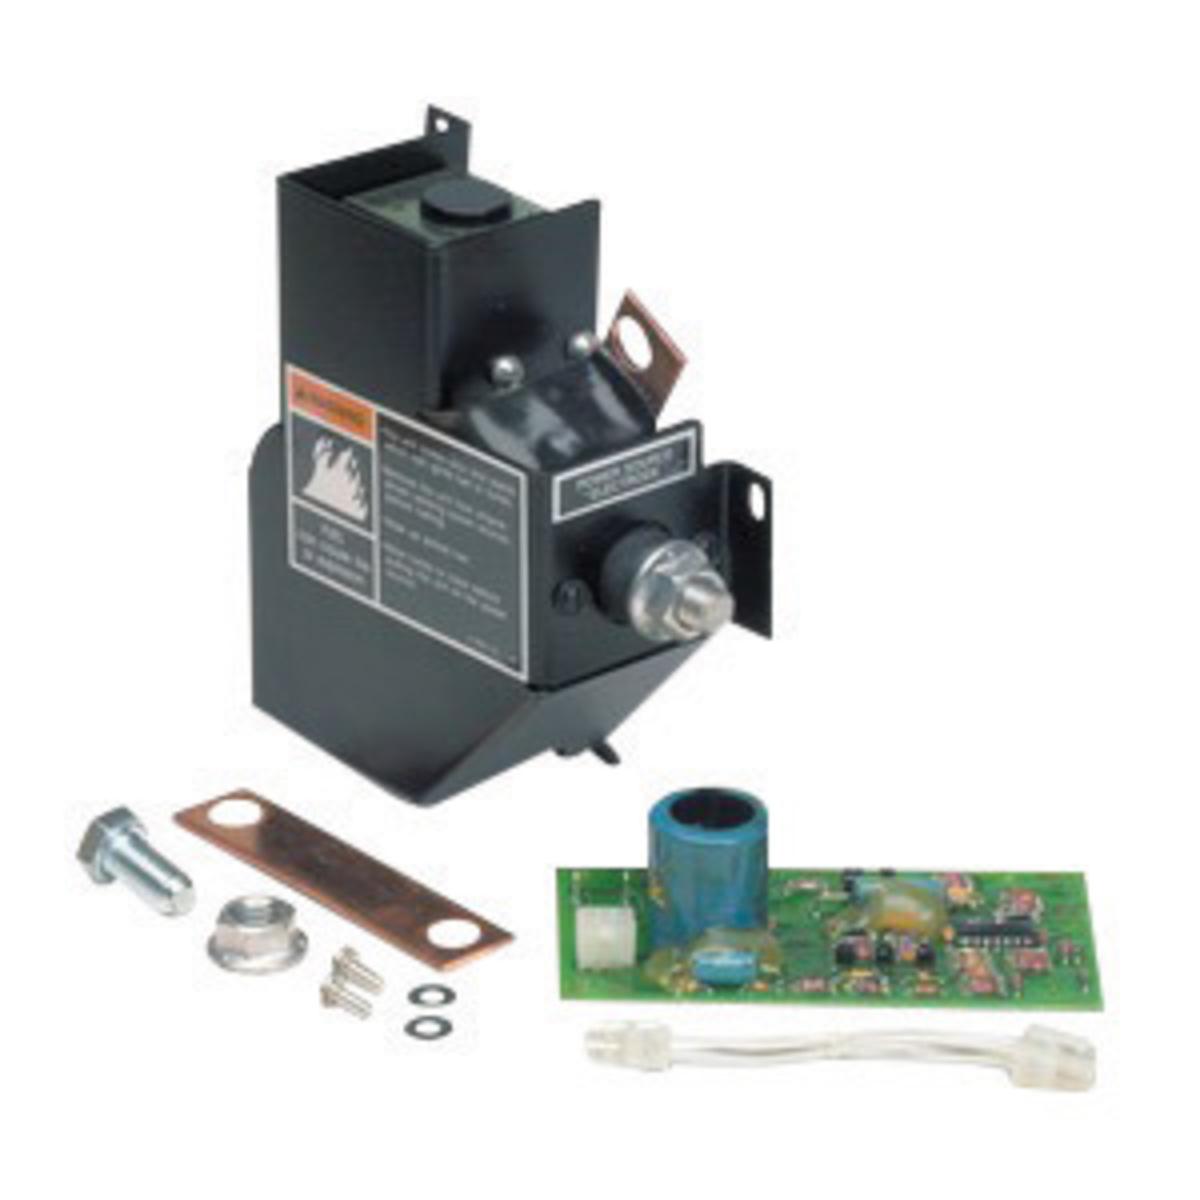 tig kit ebay itm mp welder spoolgun power w mig lincoln welders pkg